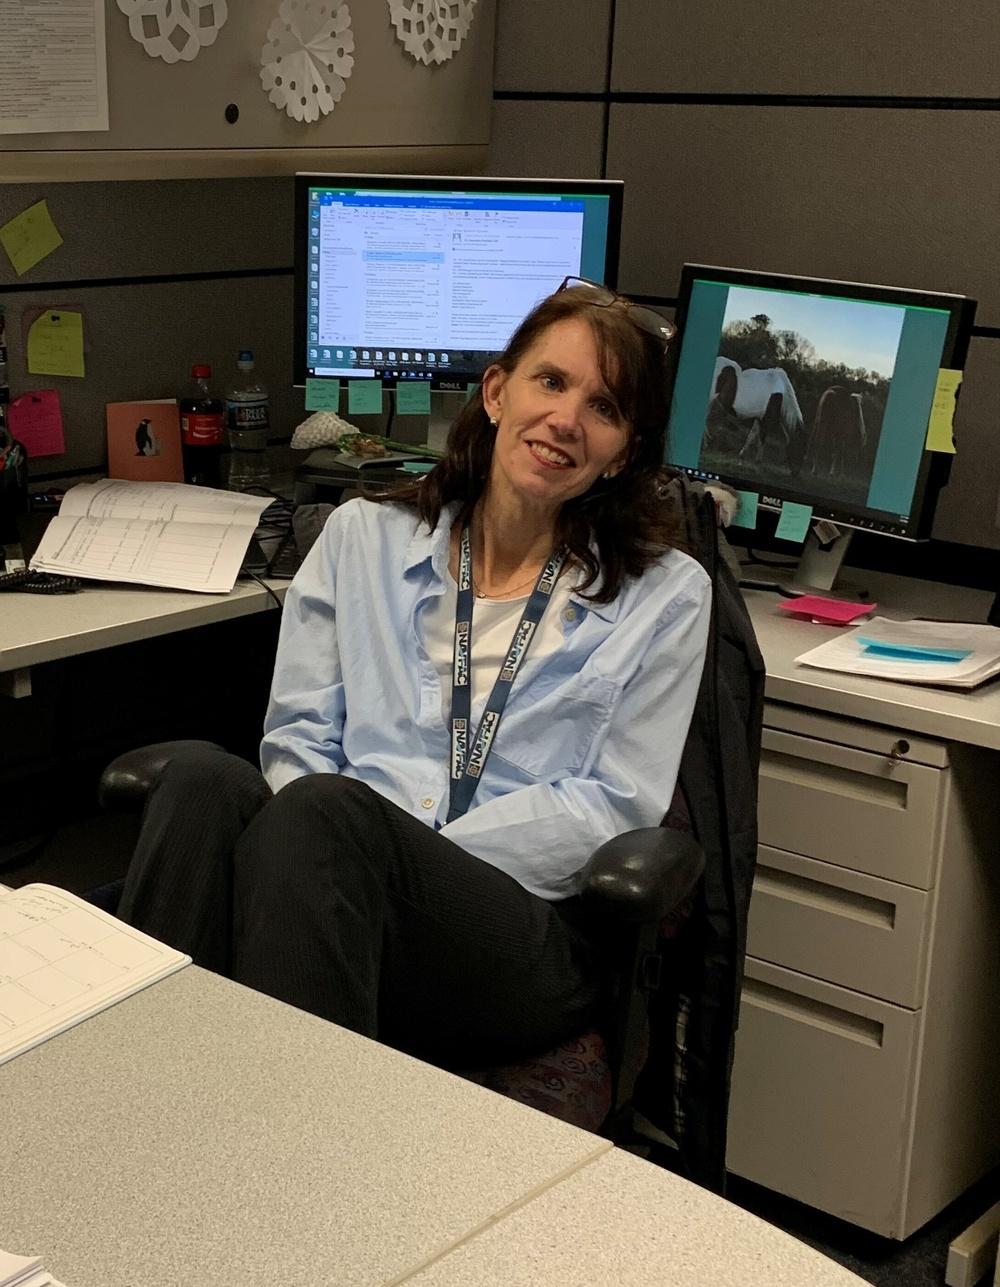 Nicole Hernandez, NAVFAC Washington environmental compliance line leader